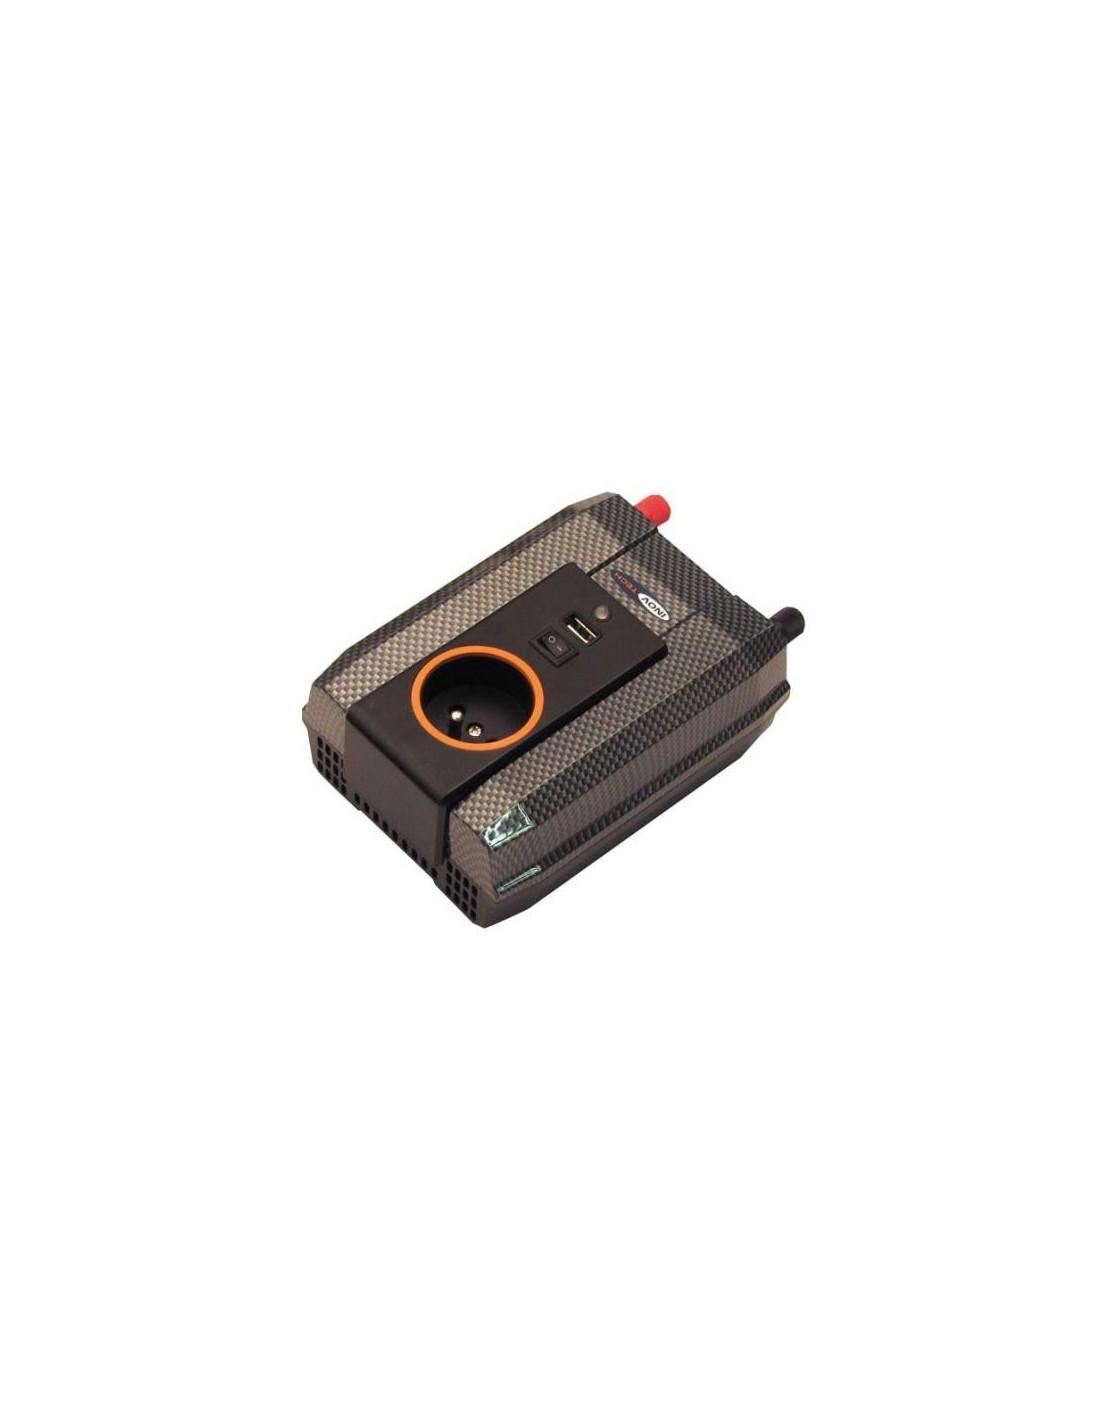 Inversor convertidor corriente 12v a 220v 400w tienda de for Transformadores de corriente 220v a 12v